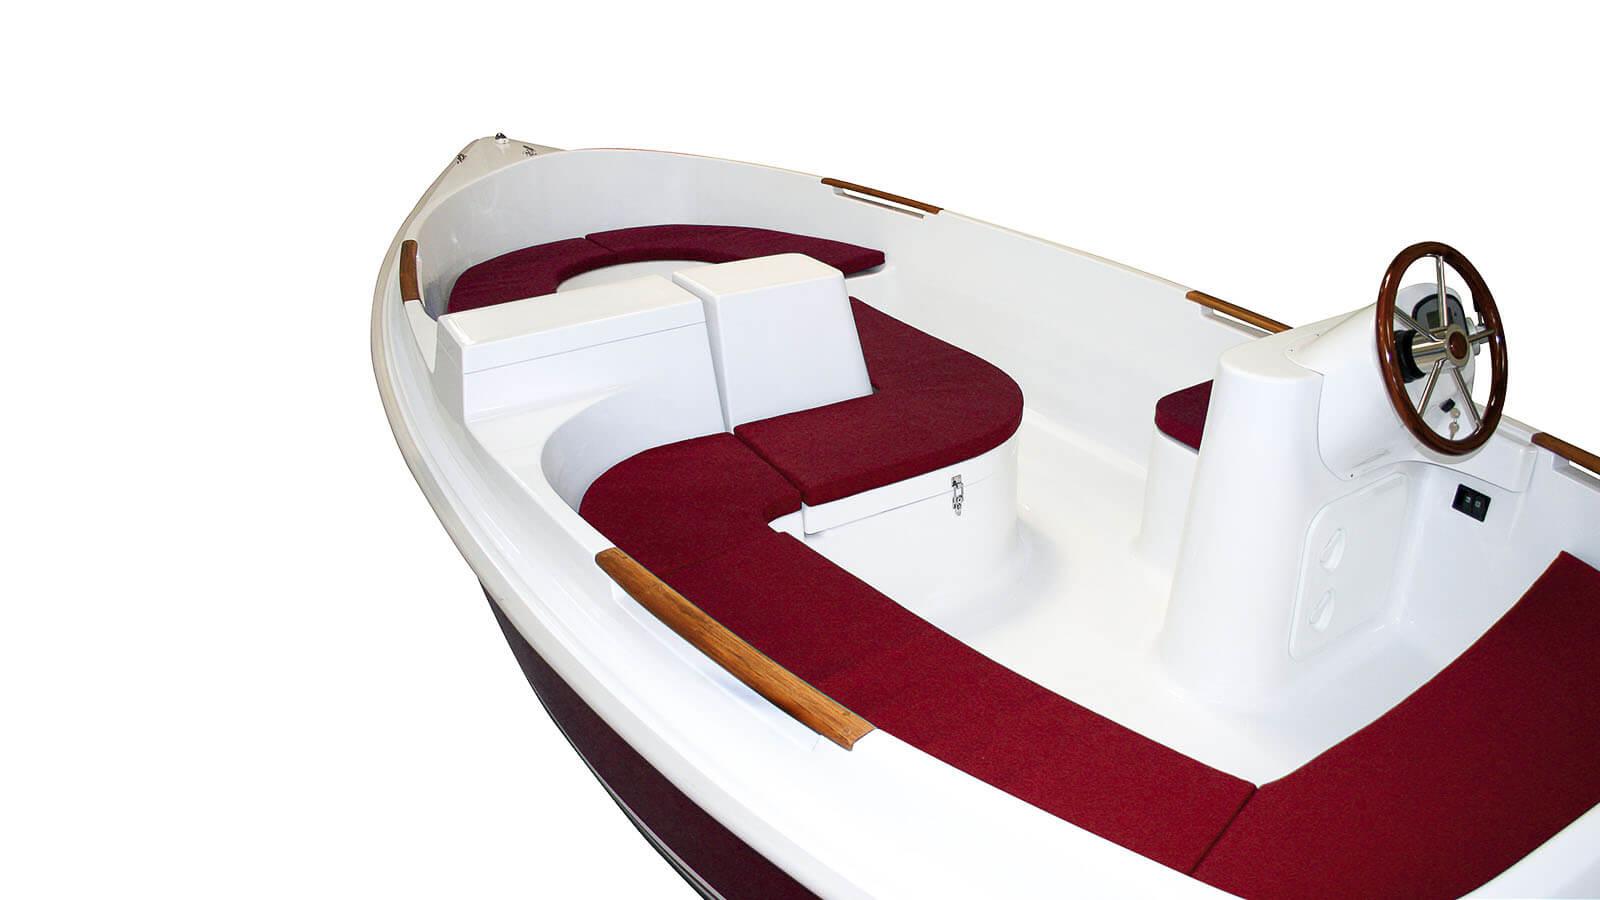 Photo du bateau sans permis Ruban Bleu MOST